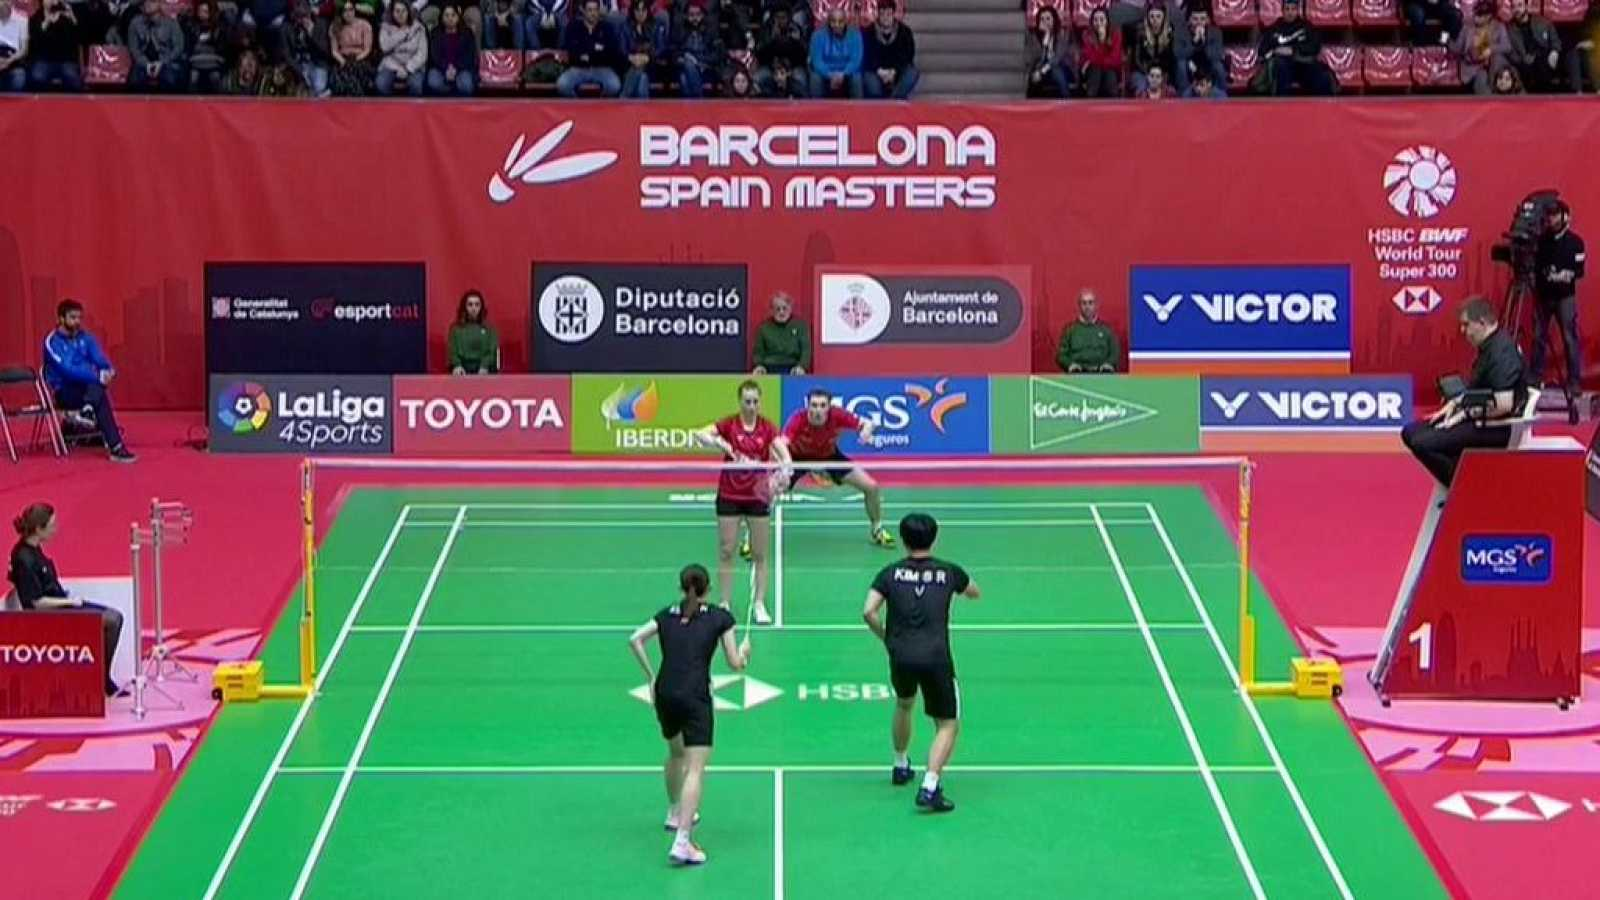 Bádminton - Barcelona Spain Masters Final Doble Mixto: Corea - Francia - ver ahora